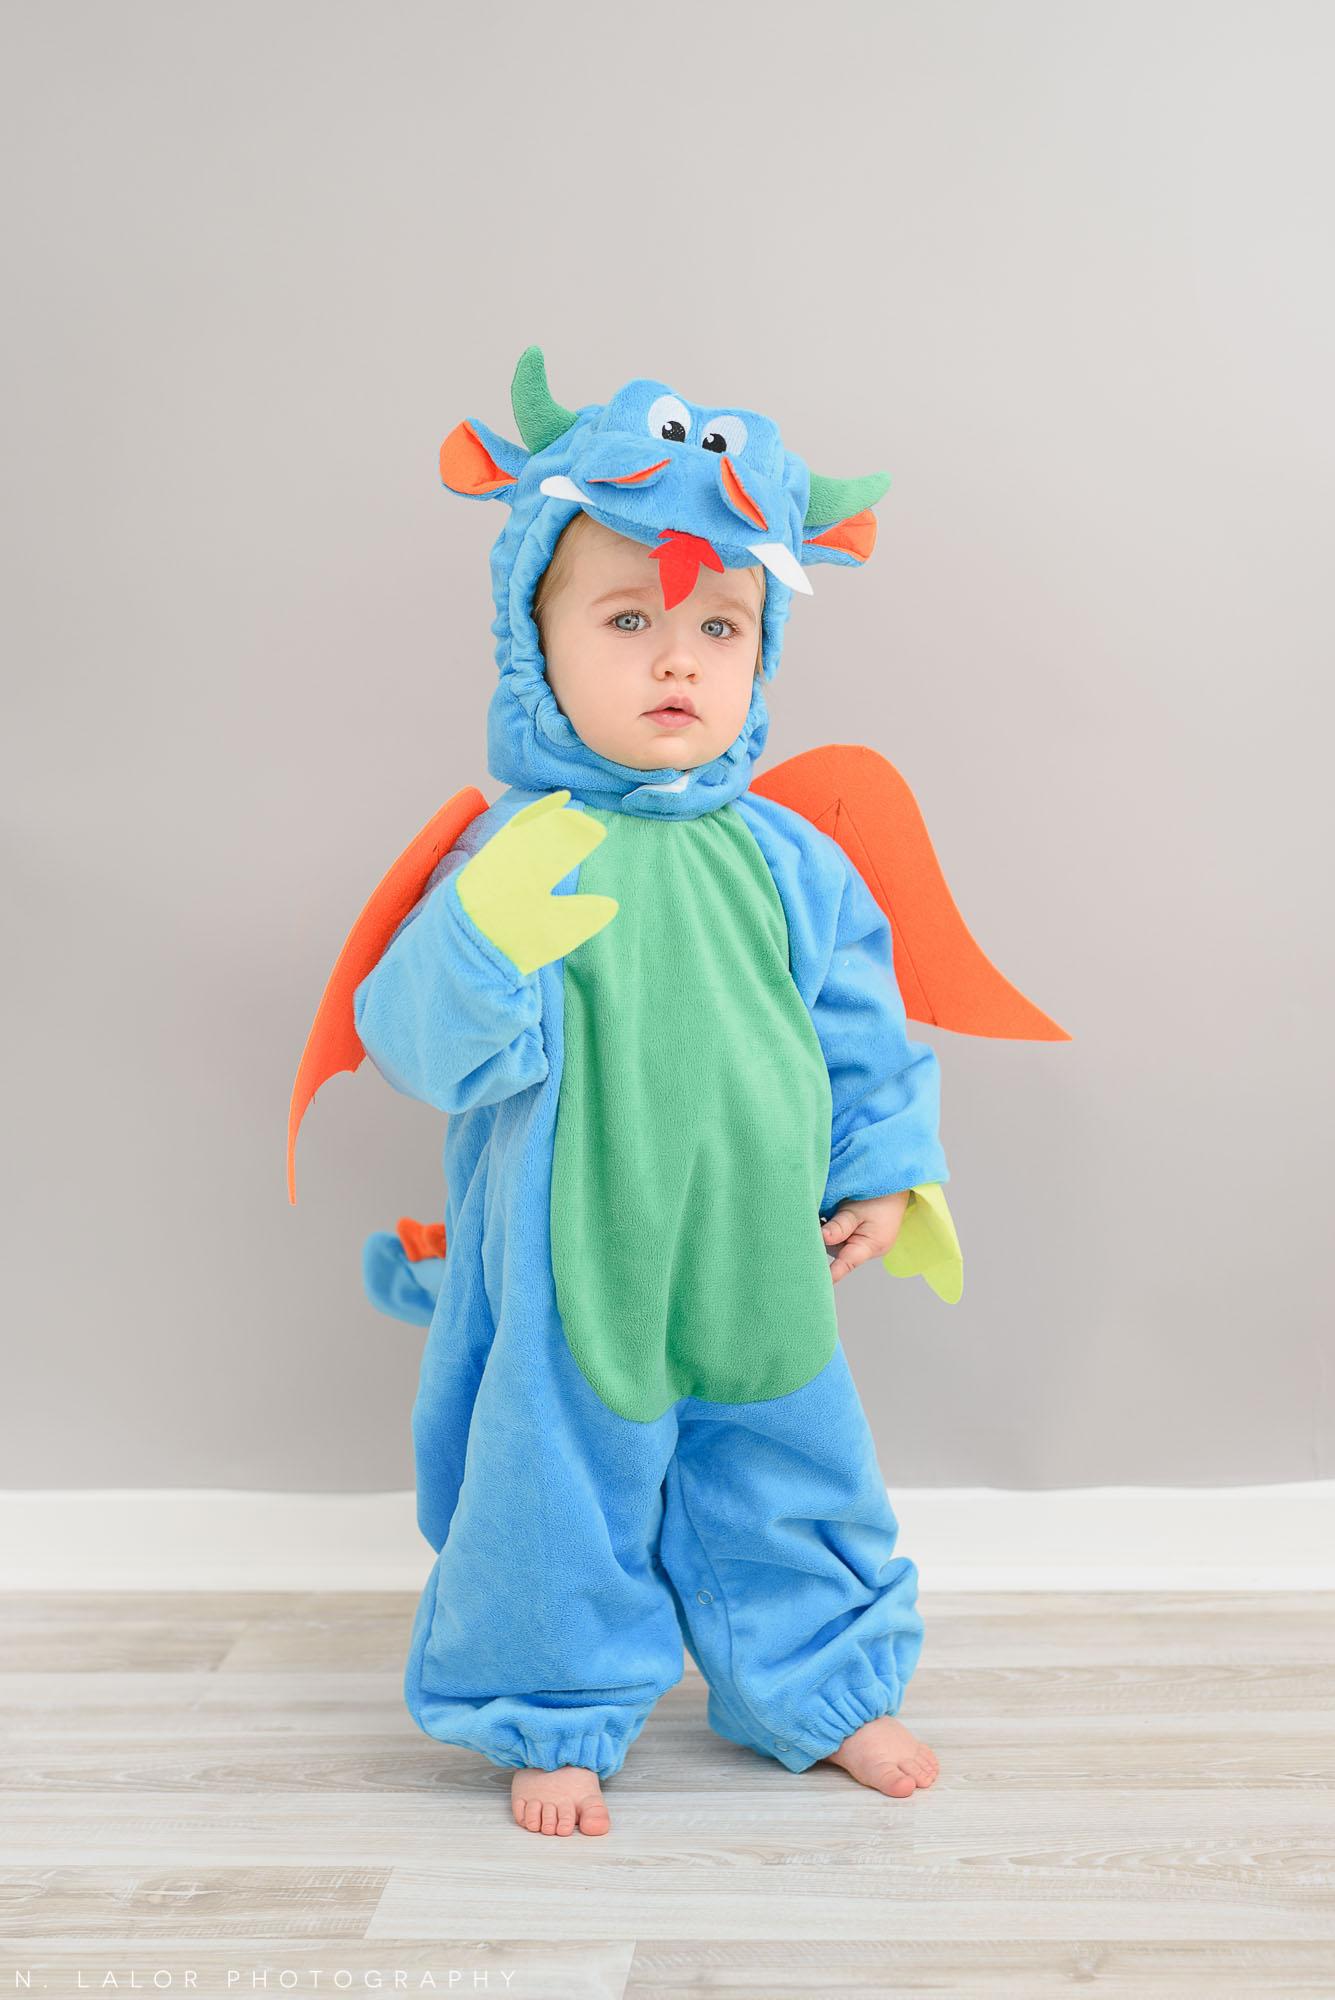 Little dragon. Halloween Kids Portrait by N. Lalor Photography. Greenwich, Connecticut.